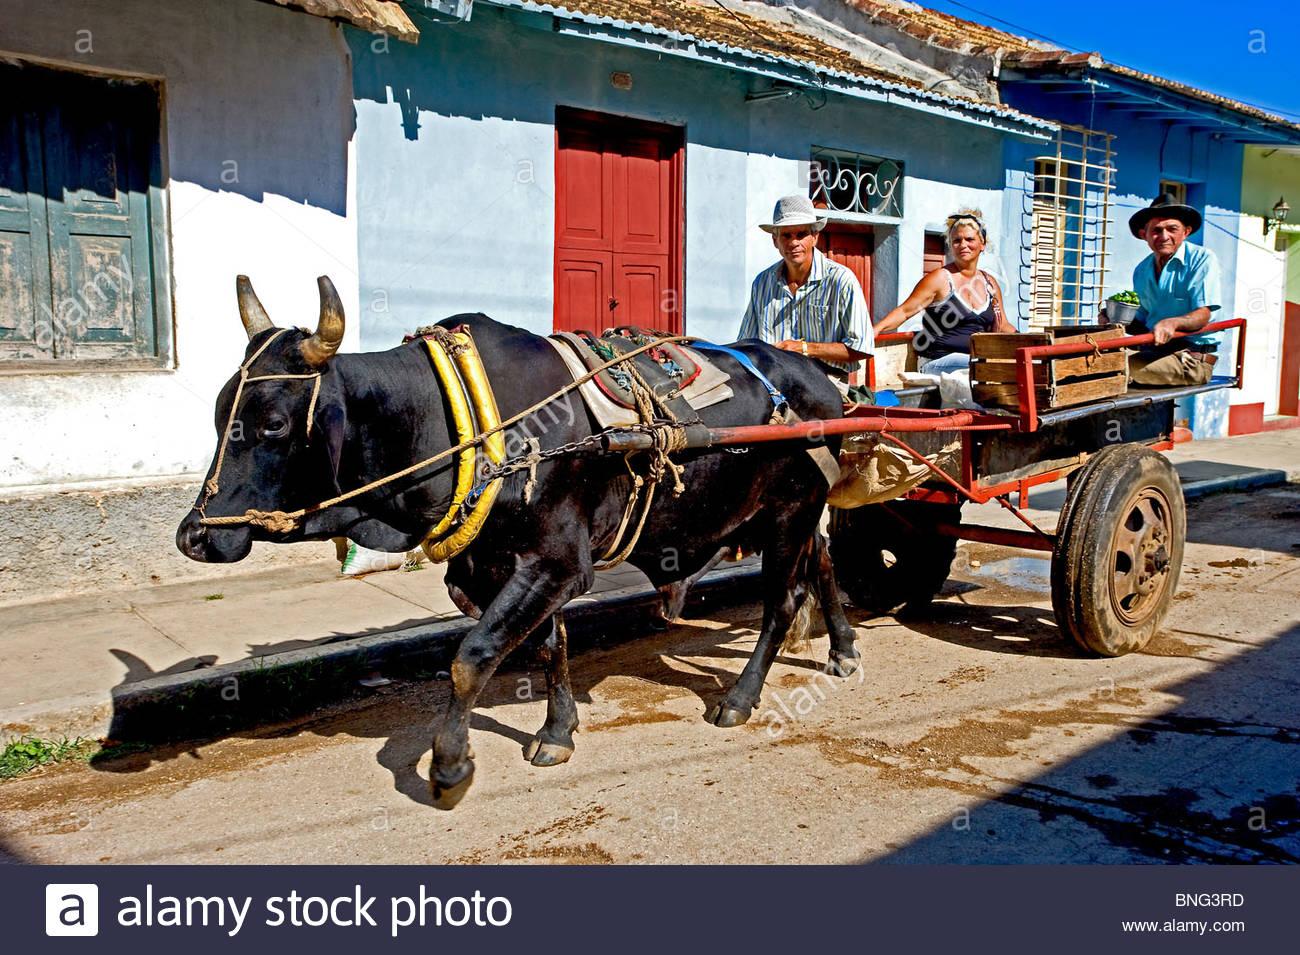 Public transport. Trinidad,province of Sancti Spiritus,Cuba - Stock Image